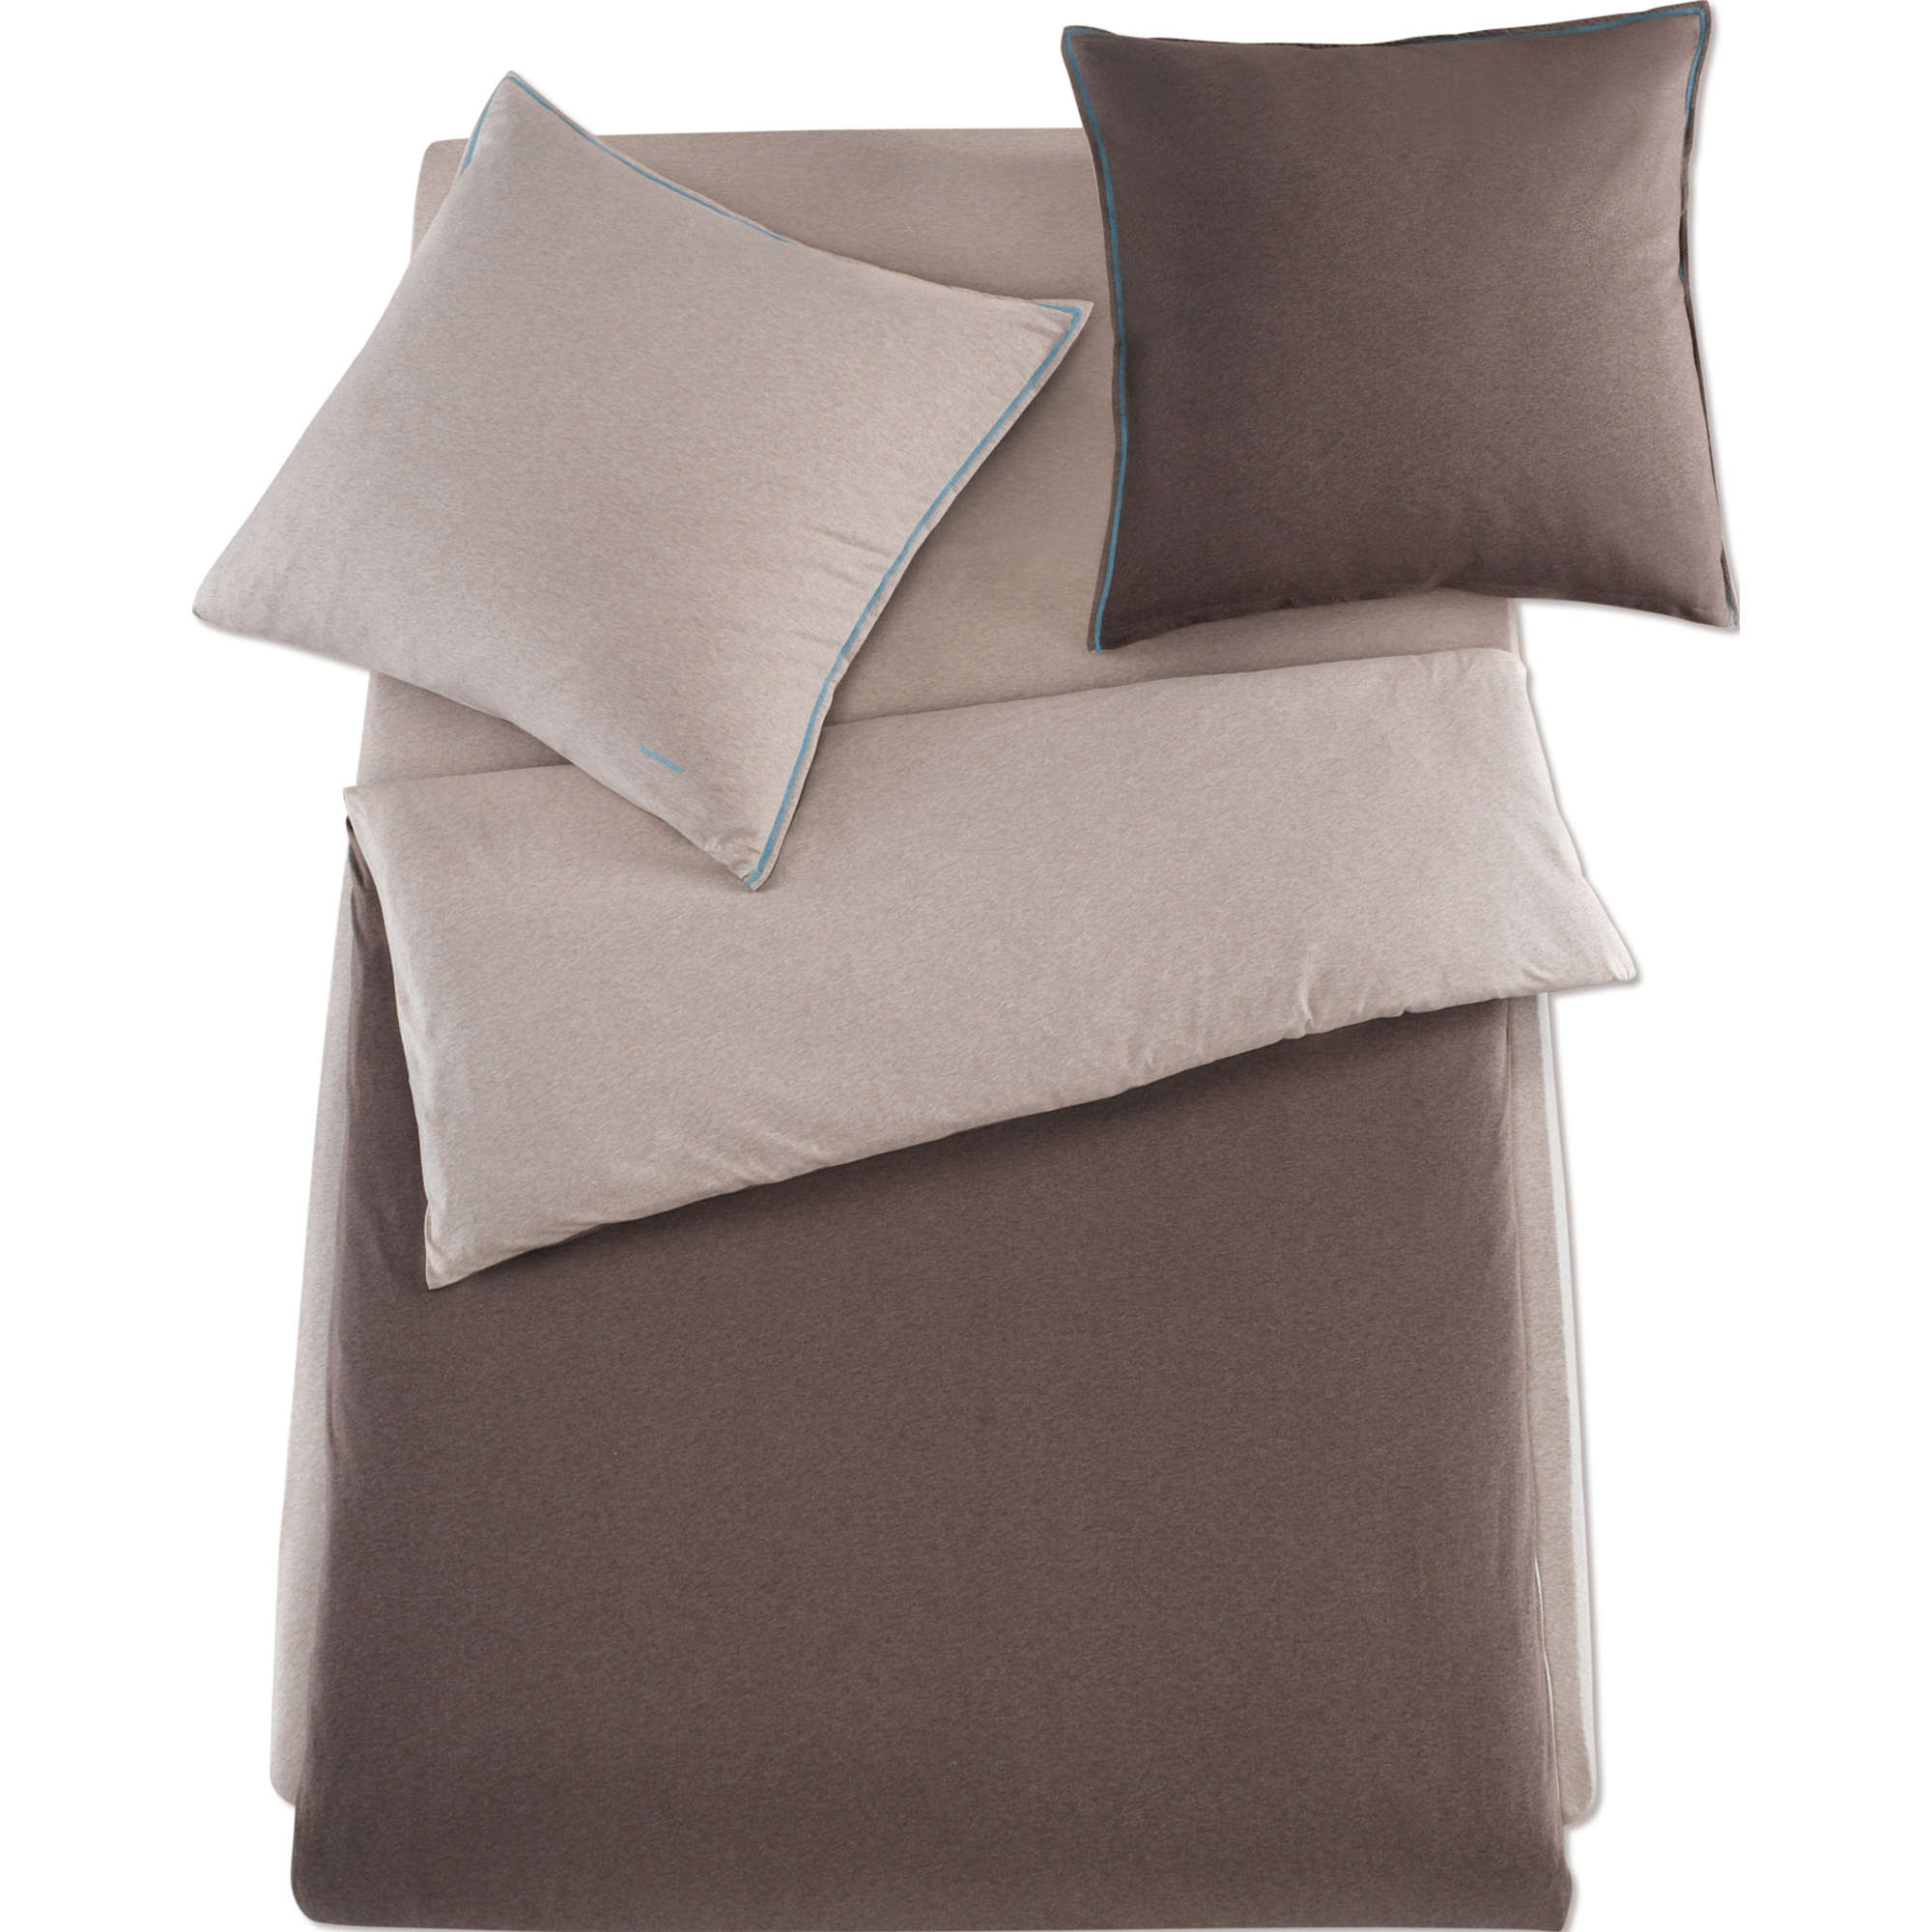 schlafgut bettw sche single jersey ebay. Black Bedroom Furniture Sets. Home Design Ideas